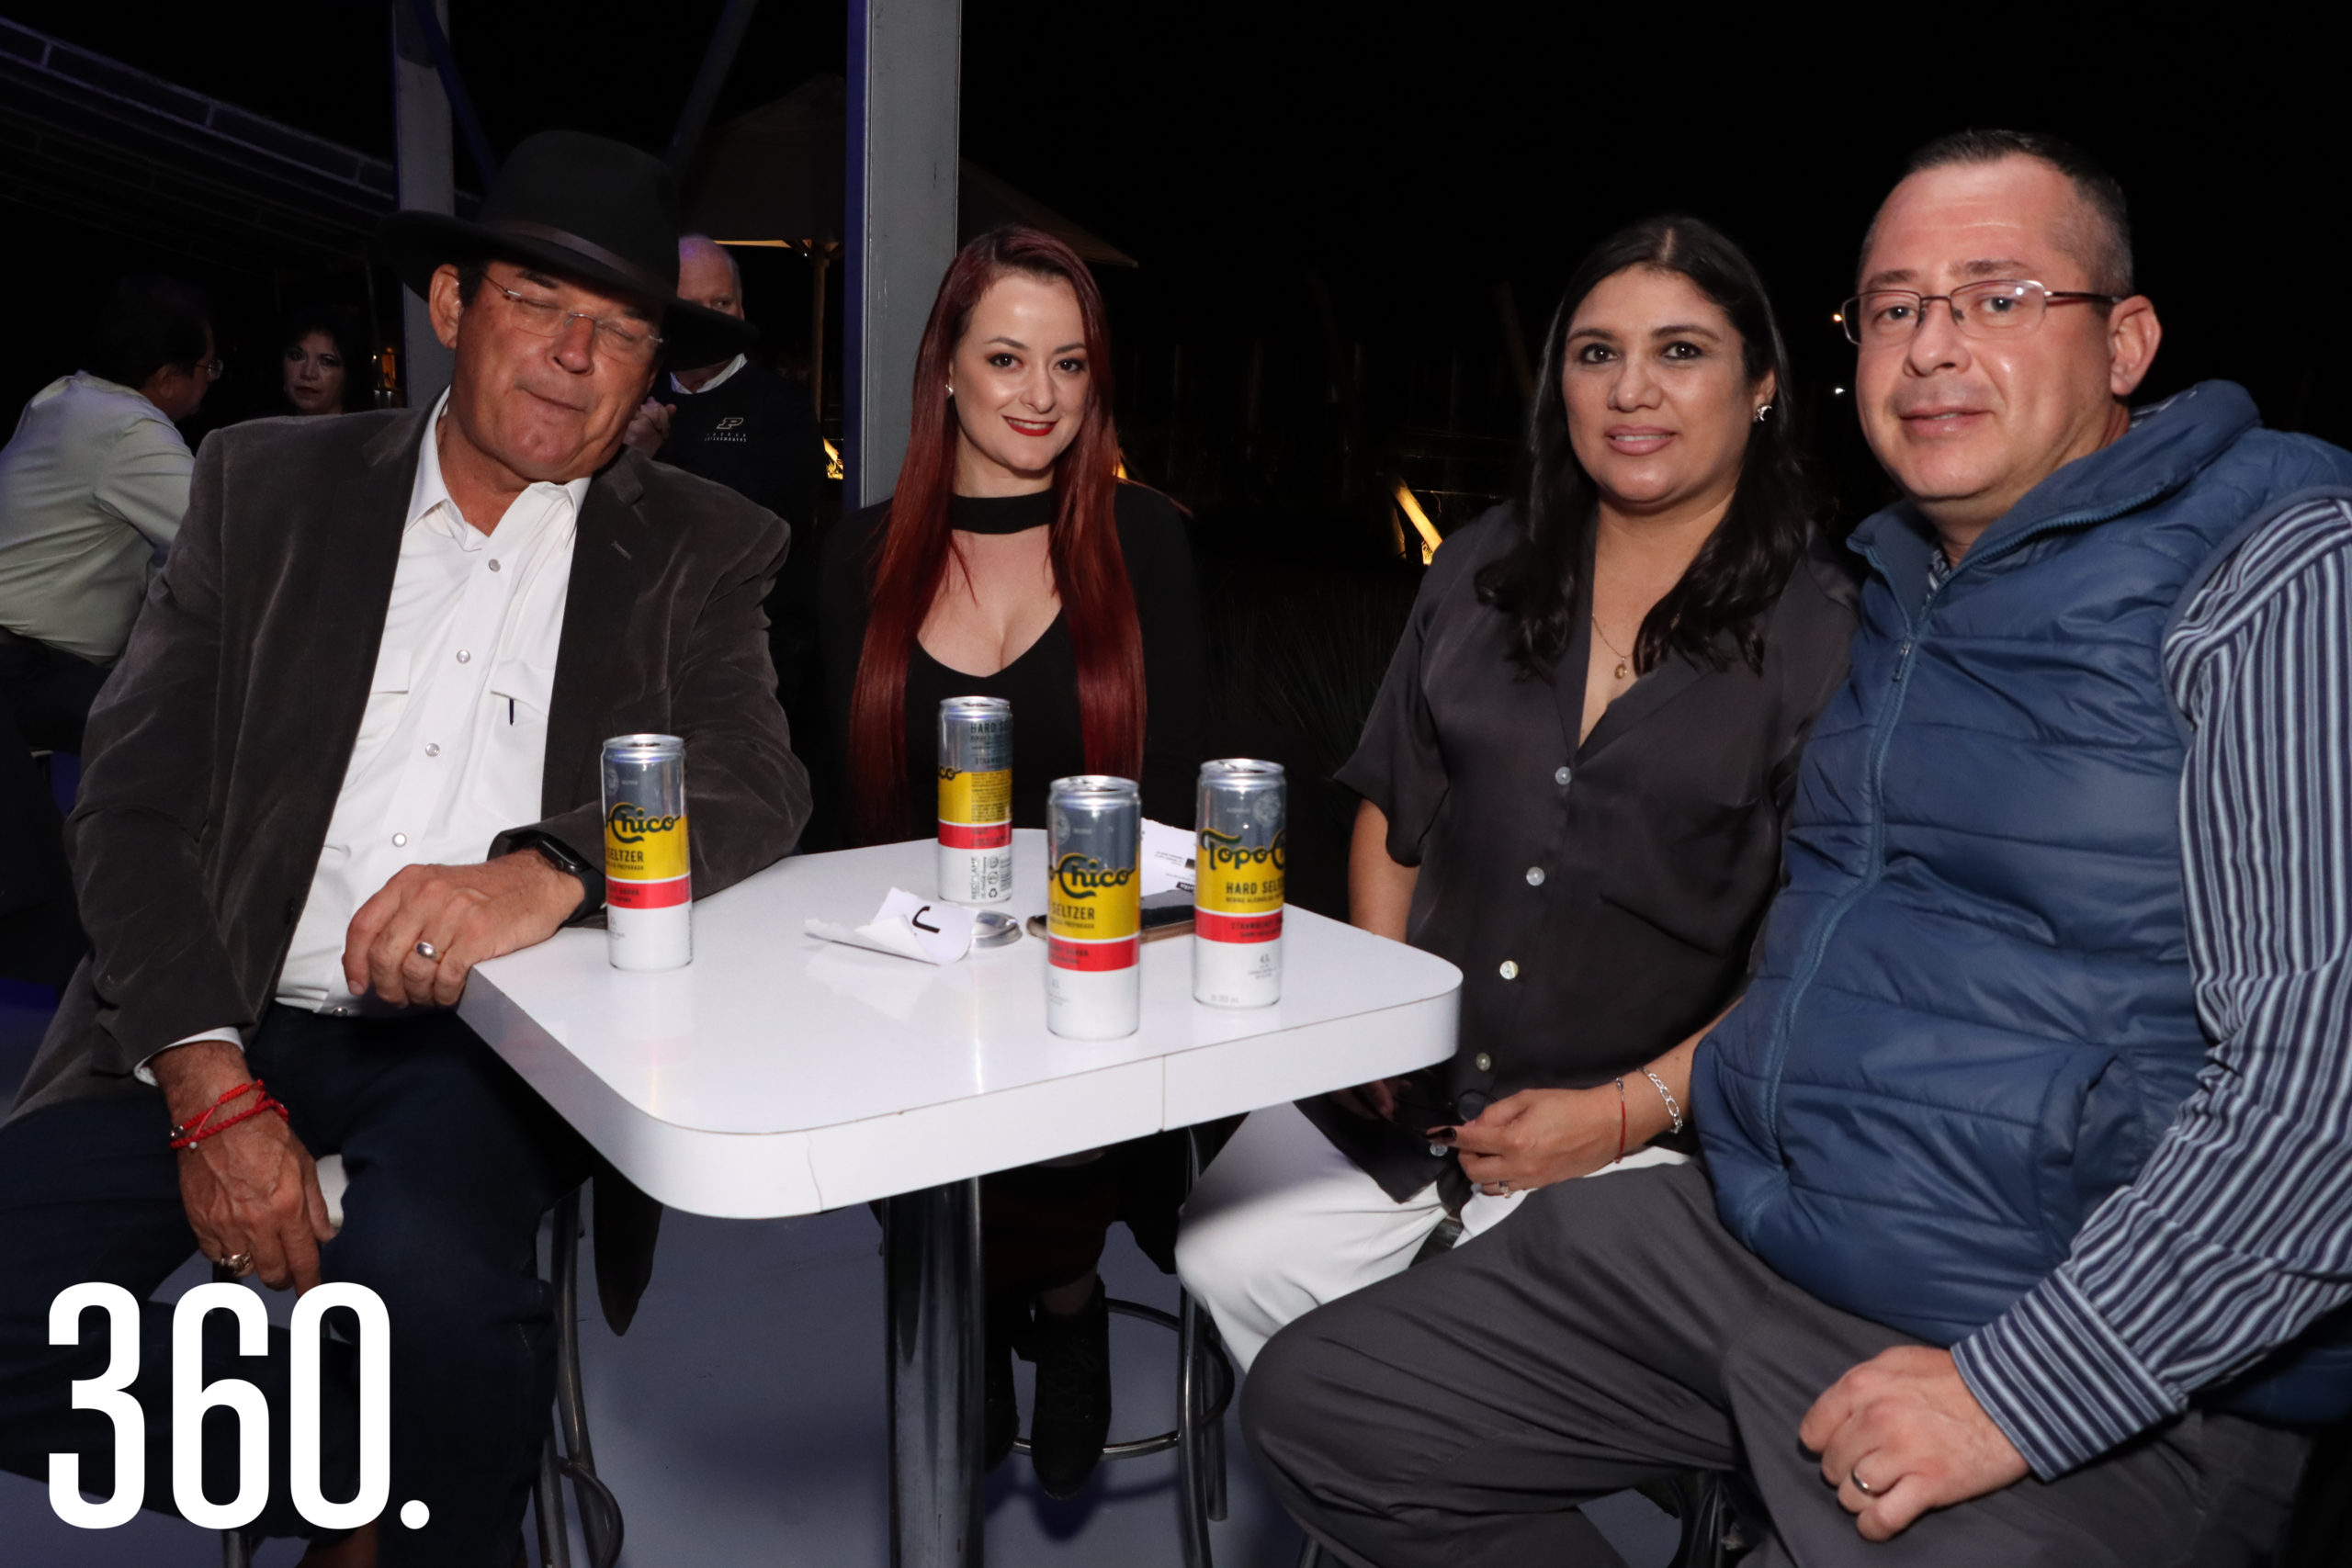 Jaime e Ilsa Guerra acompañados por Mary Barrera y Mauricio Peña.